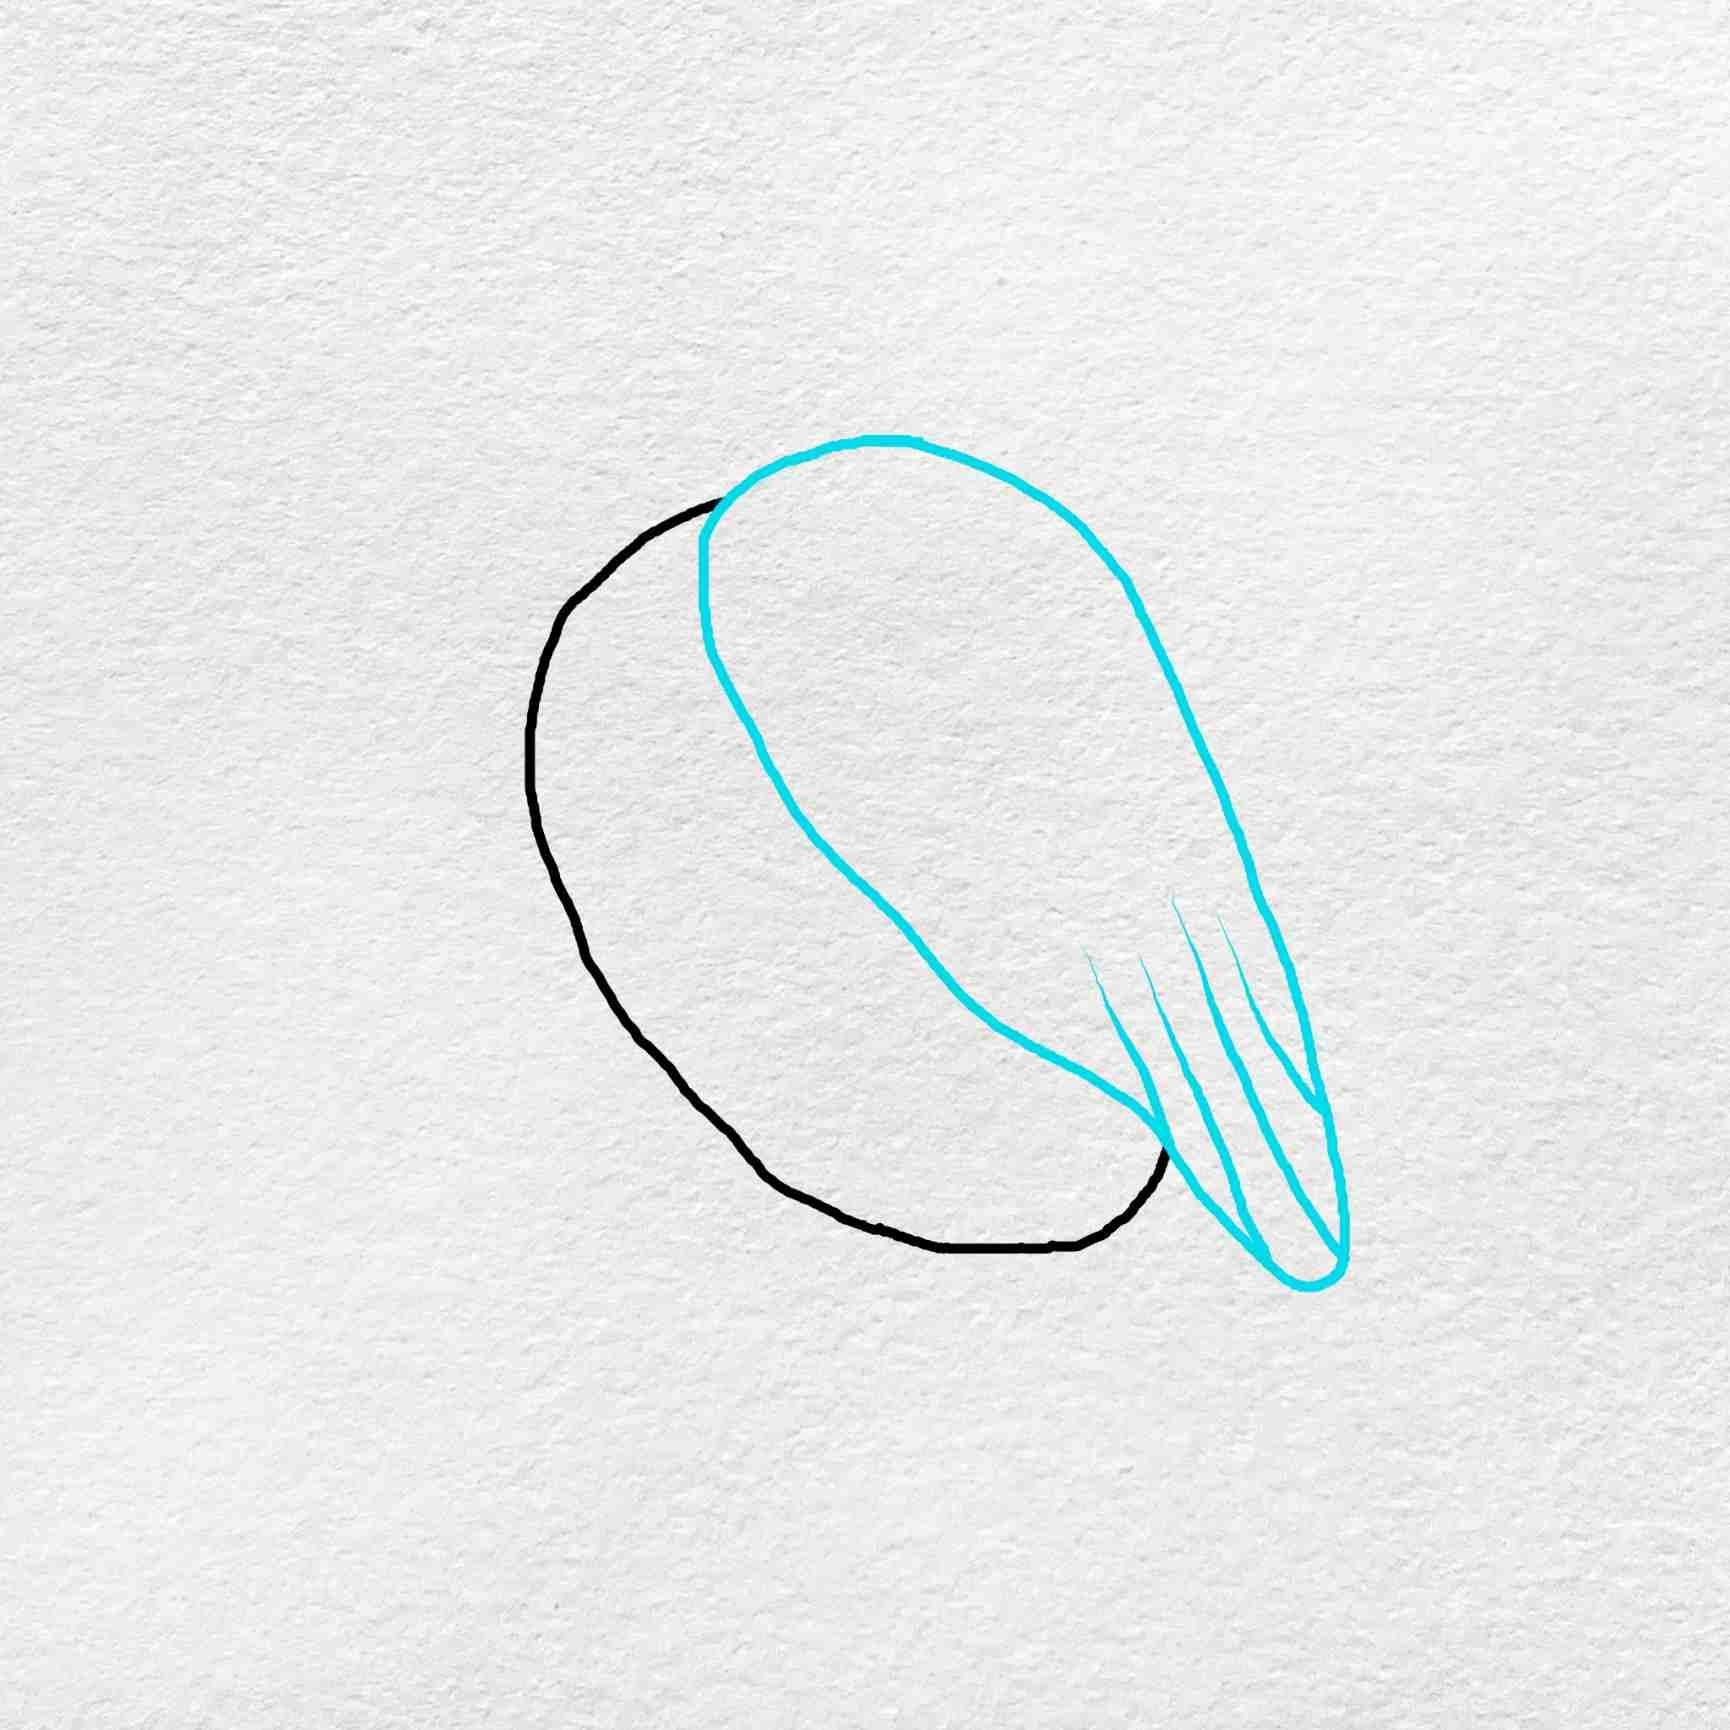 Snowy Owl Drawing: Step 2